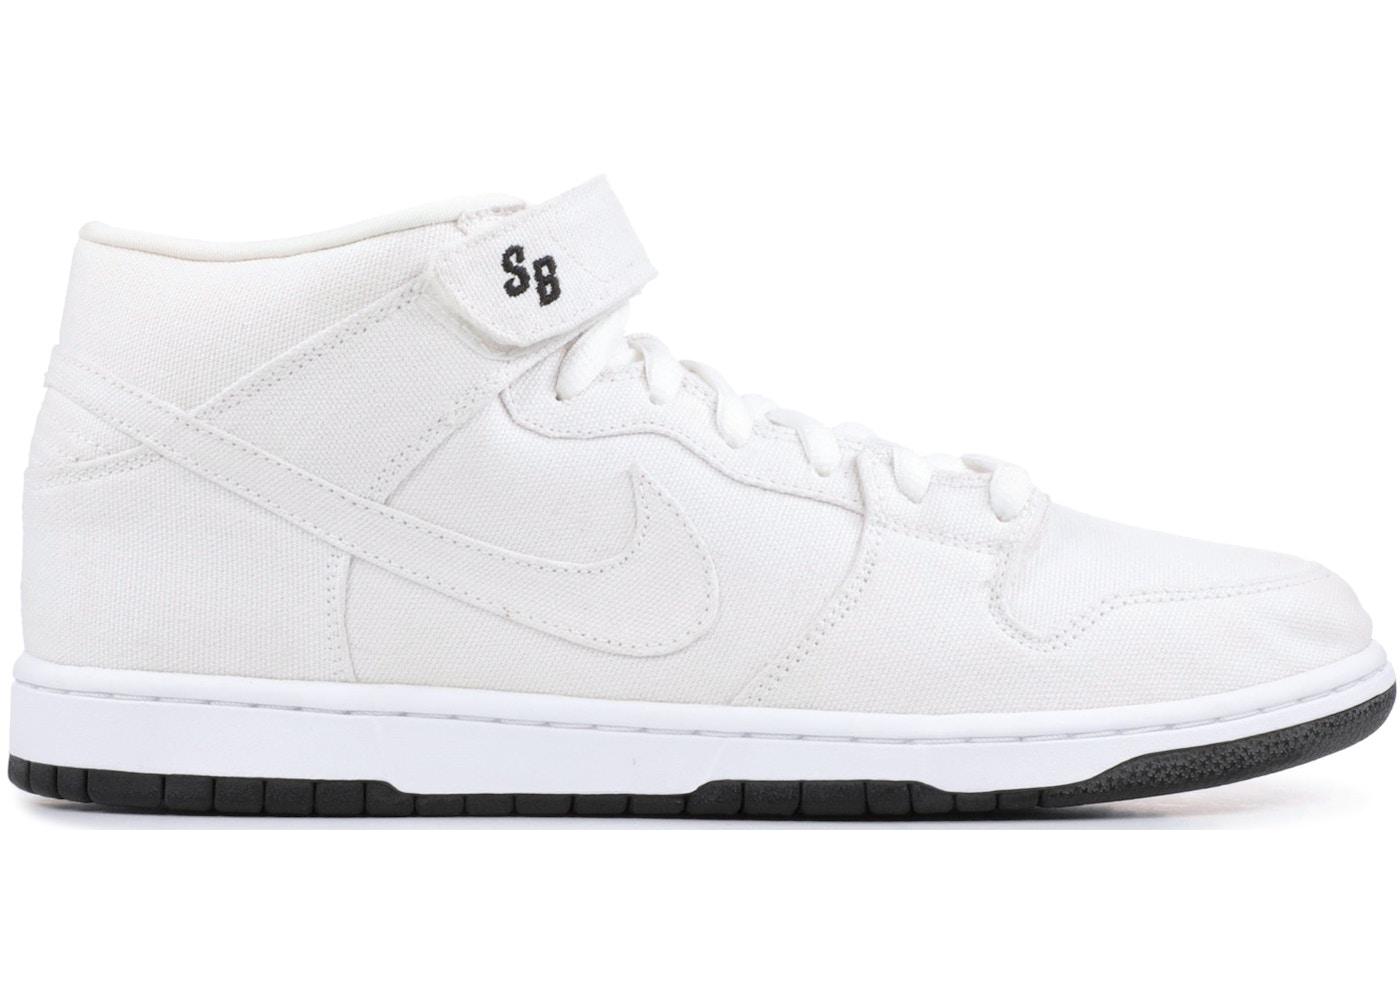 Buy Nike SB SB Dunk Mid Shoes & Deadstock Sneakers